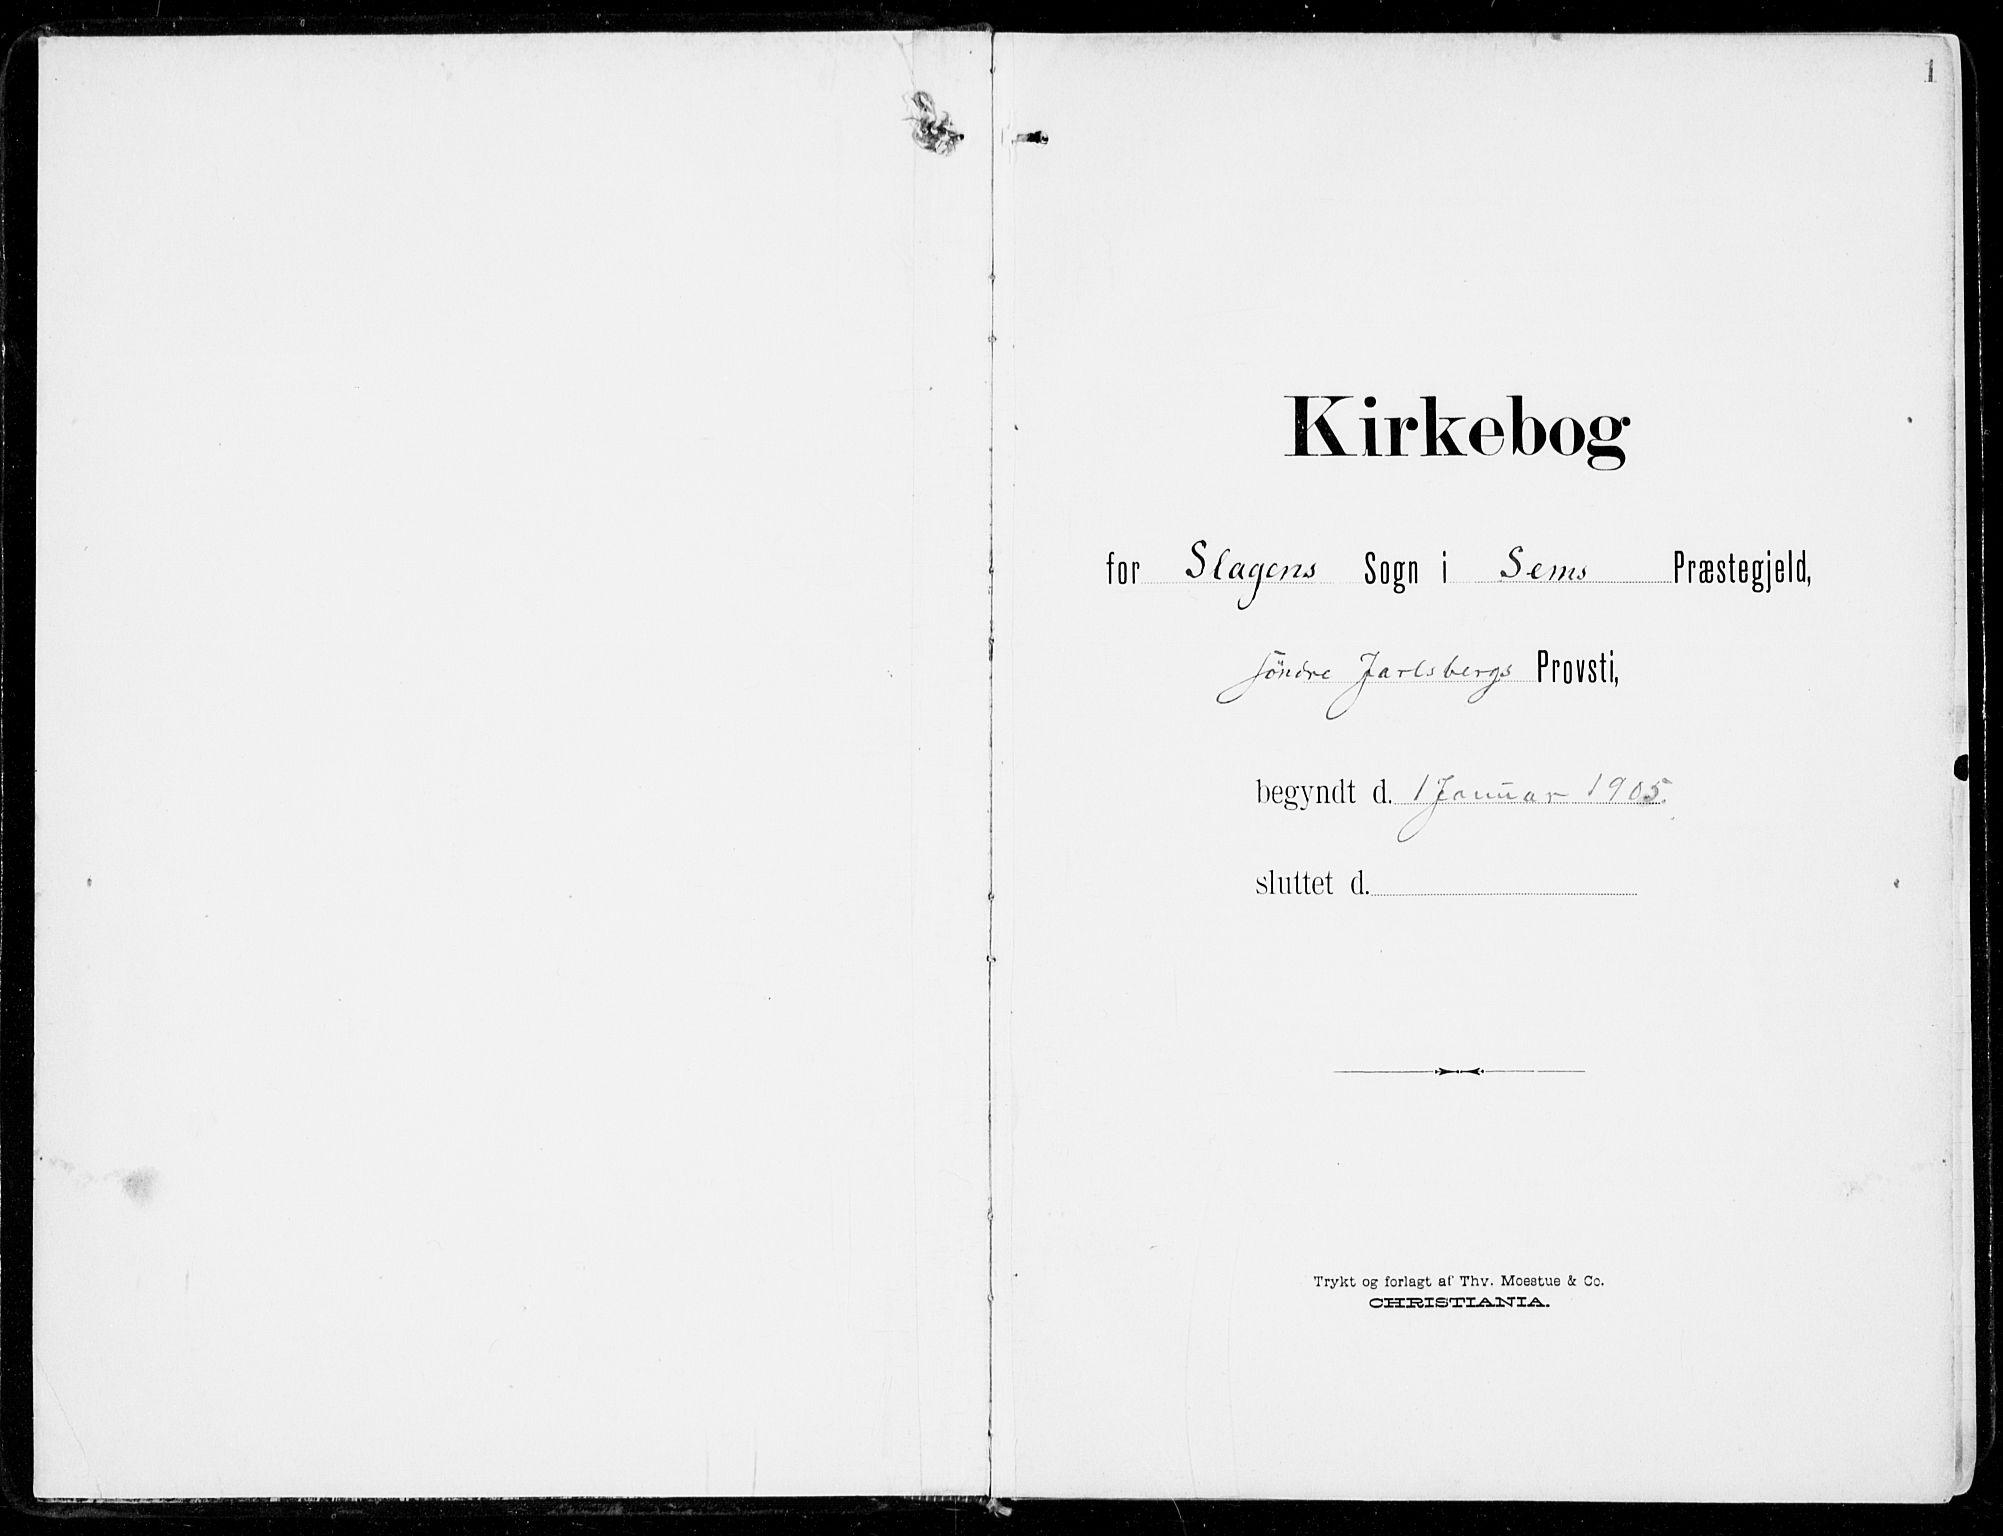 SAKO, Sem kirkebøker, F/Fb/L0006: Ministerialbok nr. II 6, 1905-1918, s. 1